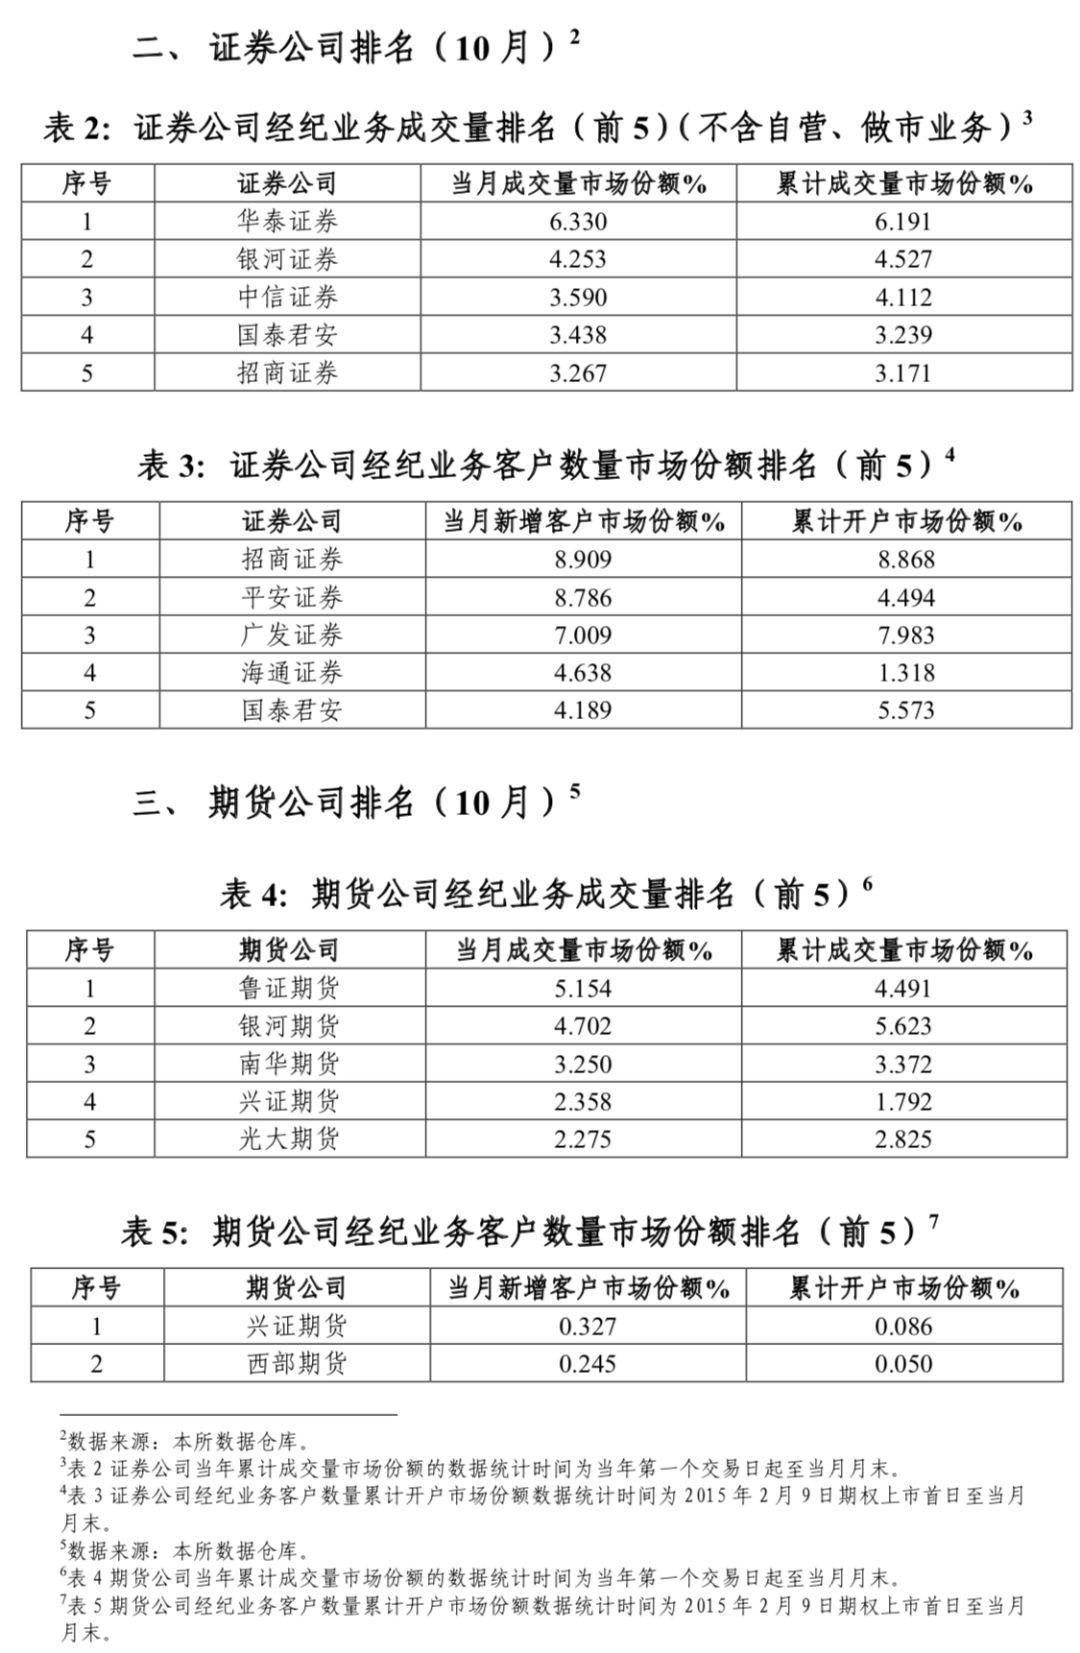 www兰桂坊com,盘点老干部霍建华和林心如戴过的手表!